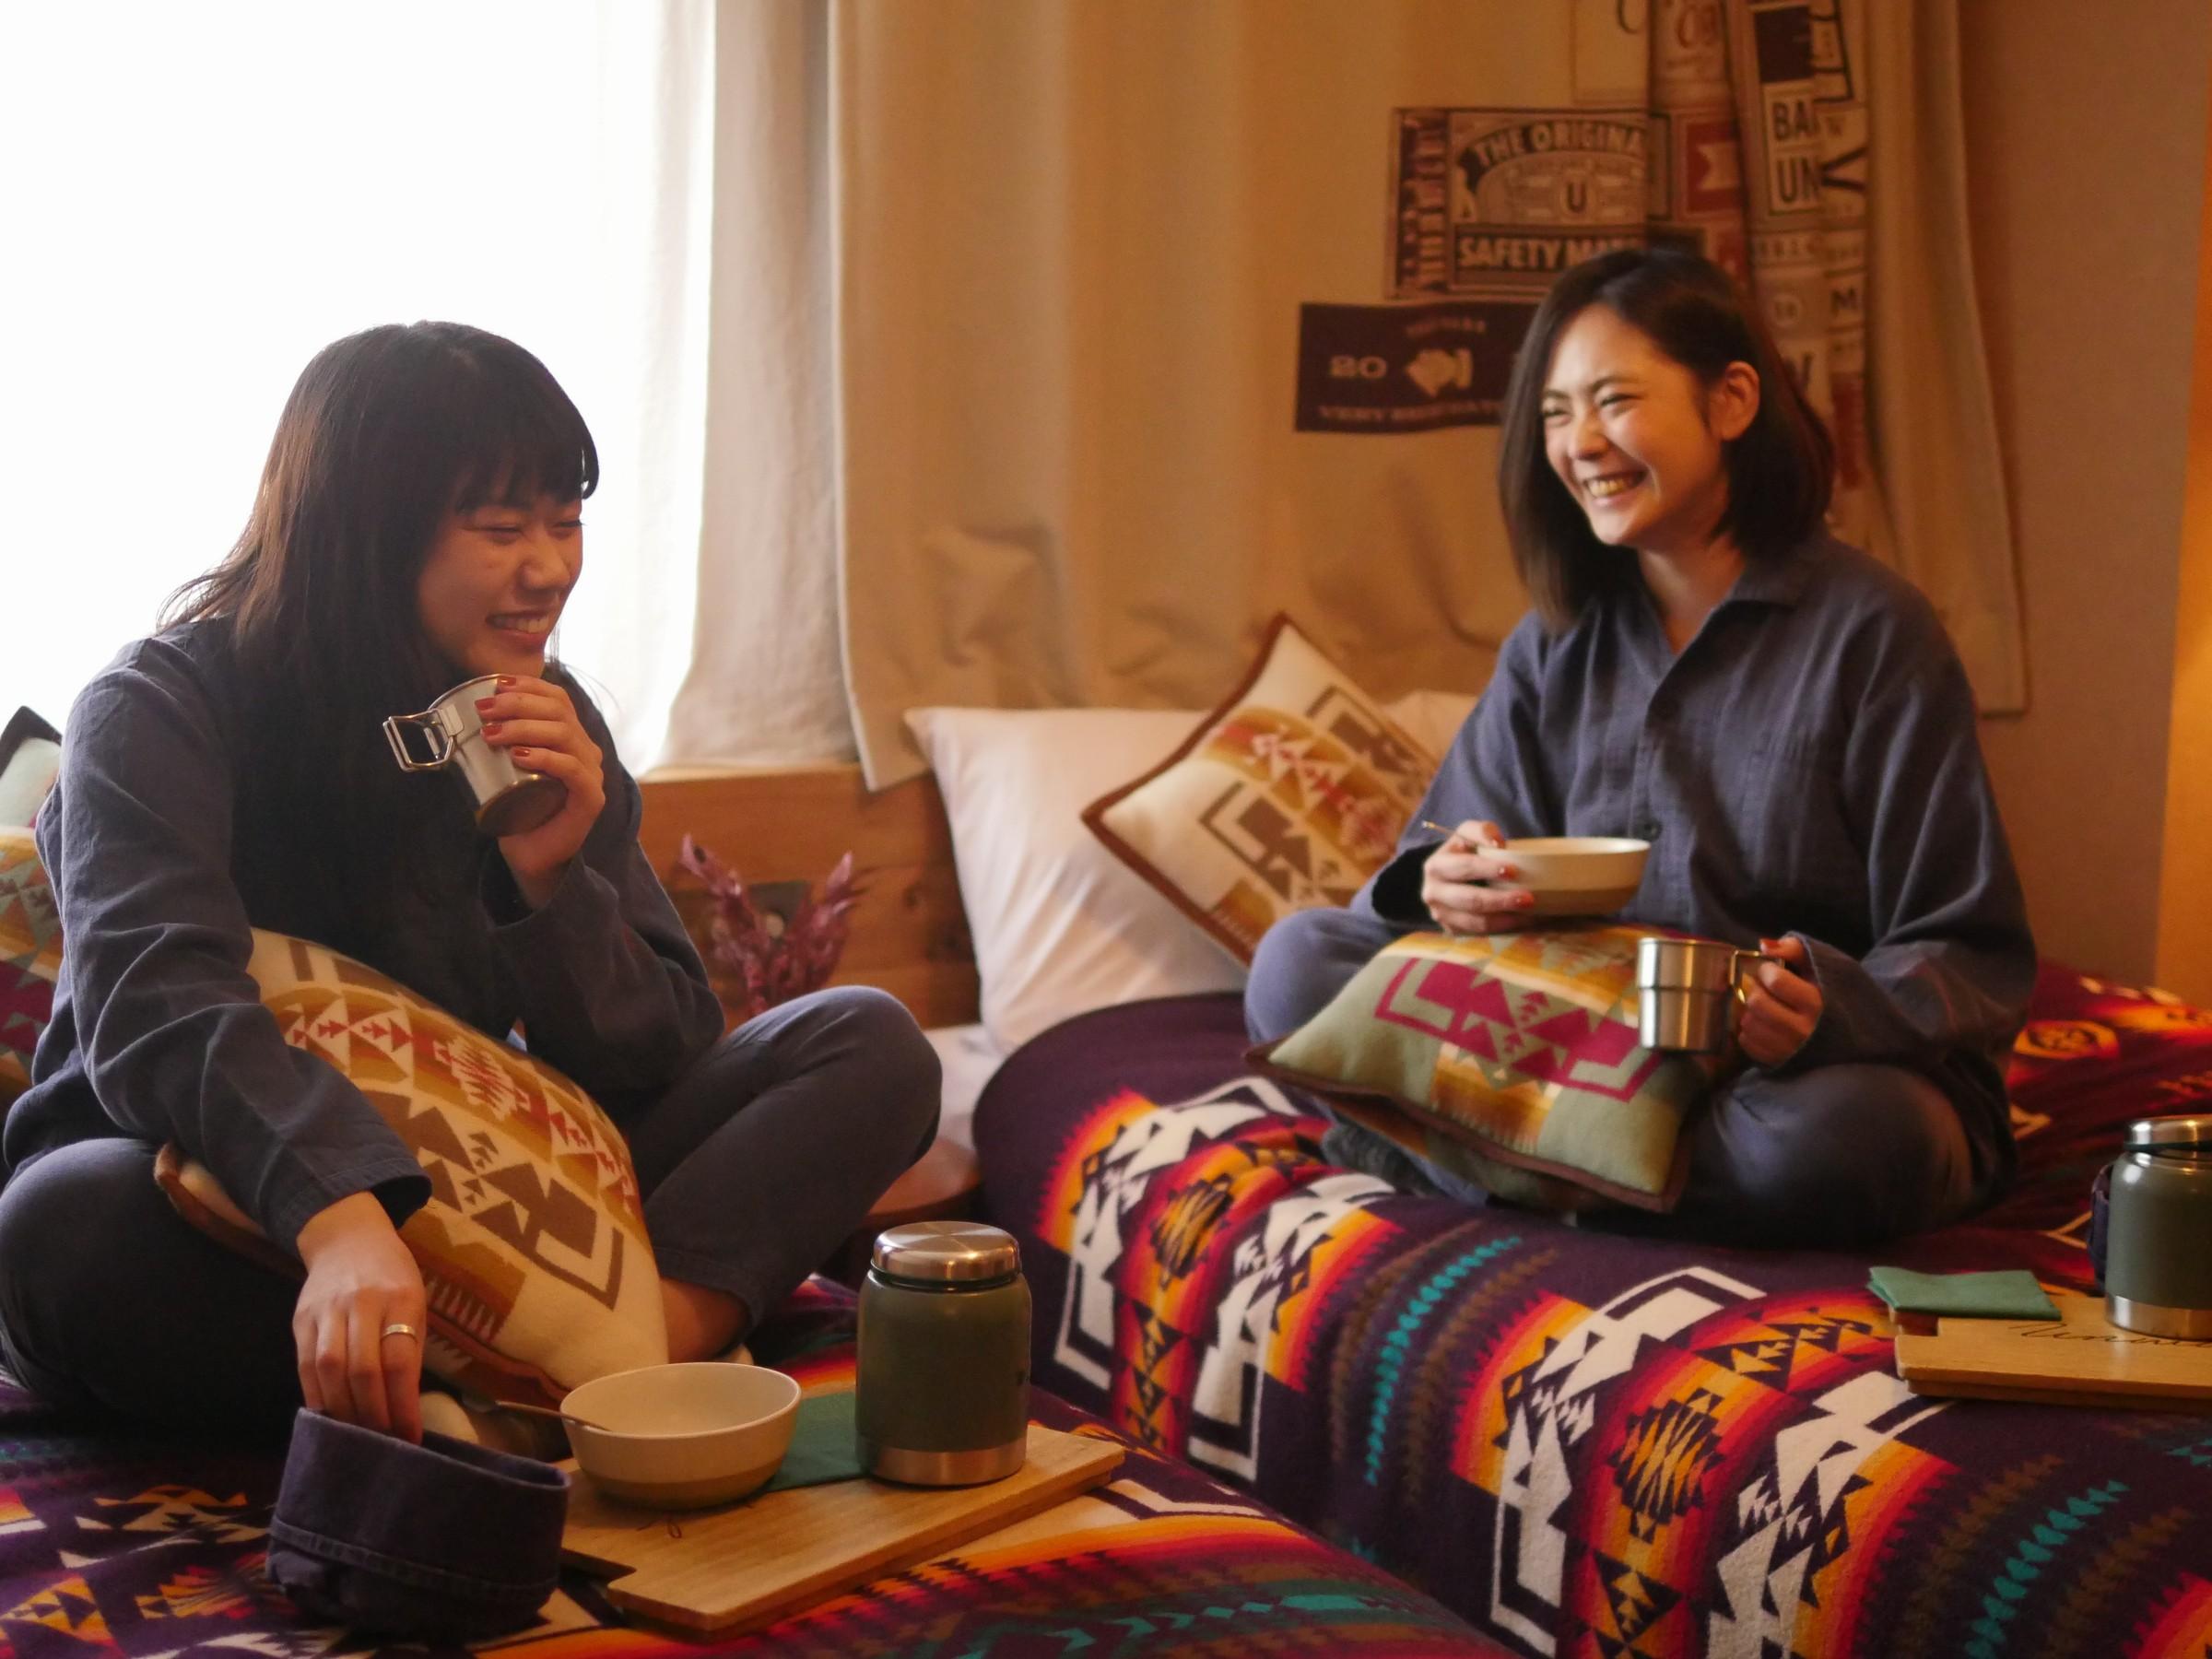 UNWIND HOTEL&BAR / 【HP限定】john masters organicsアメニティ&フルーツカクテル付き女子旅プラン【